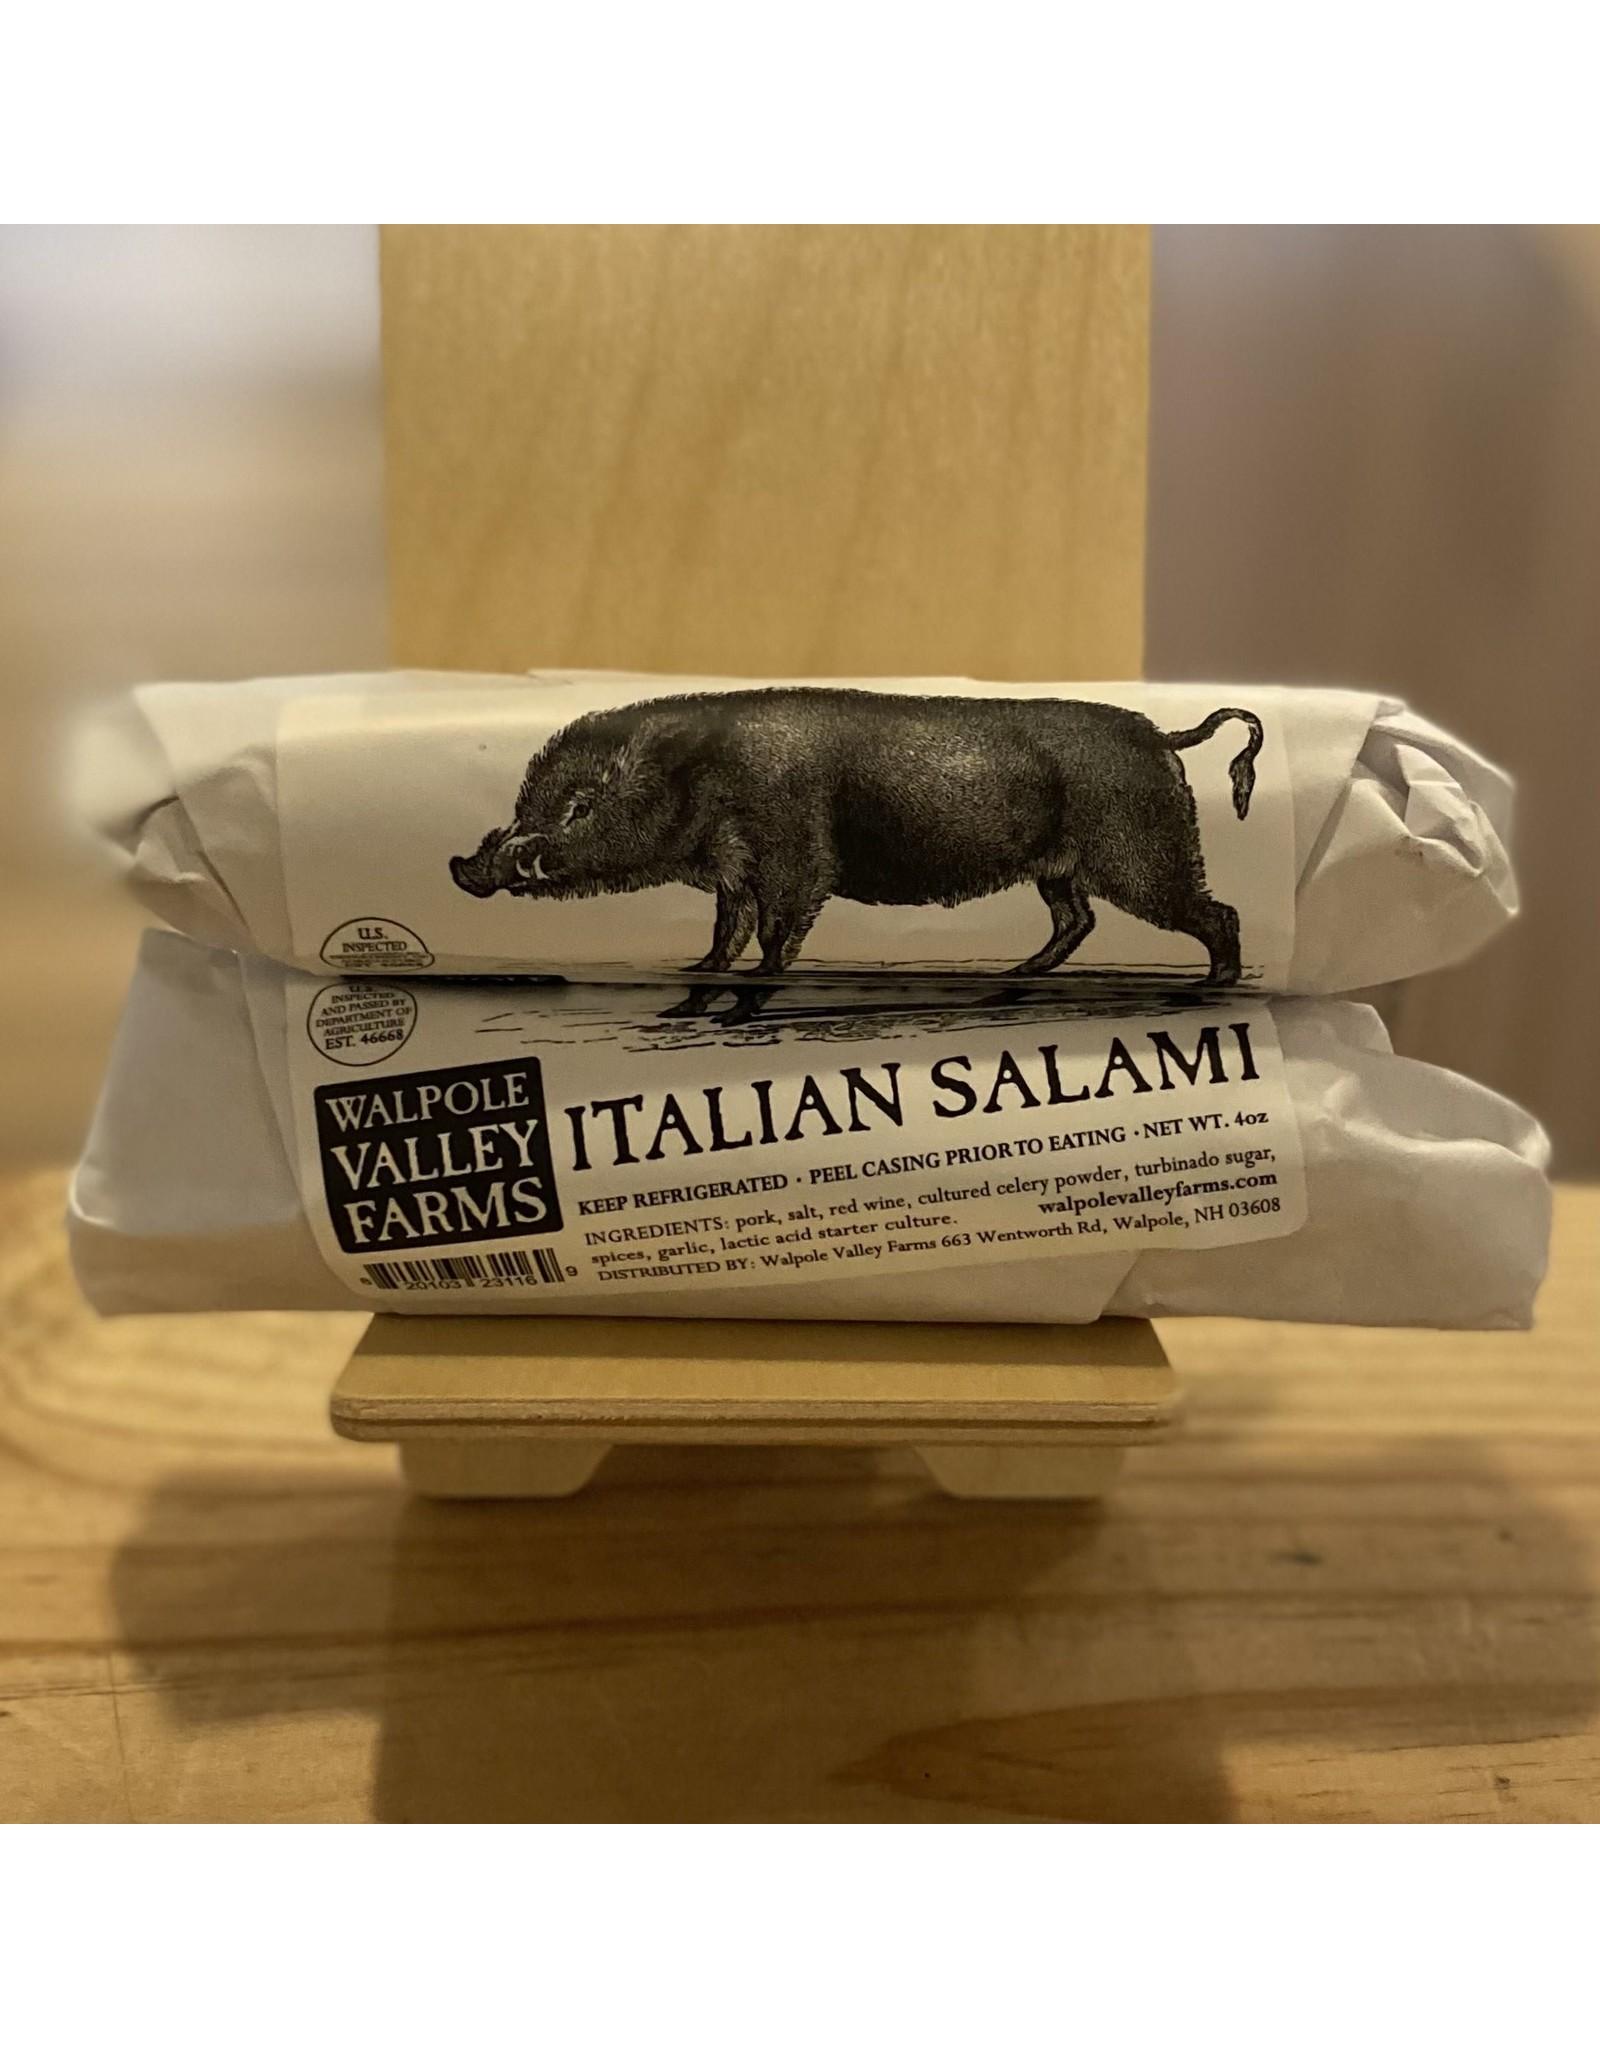 Meat Walpole Valley Farms Italian Salami - Walpole, New Hampshire